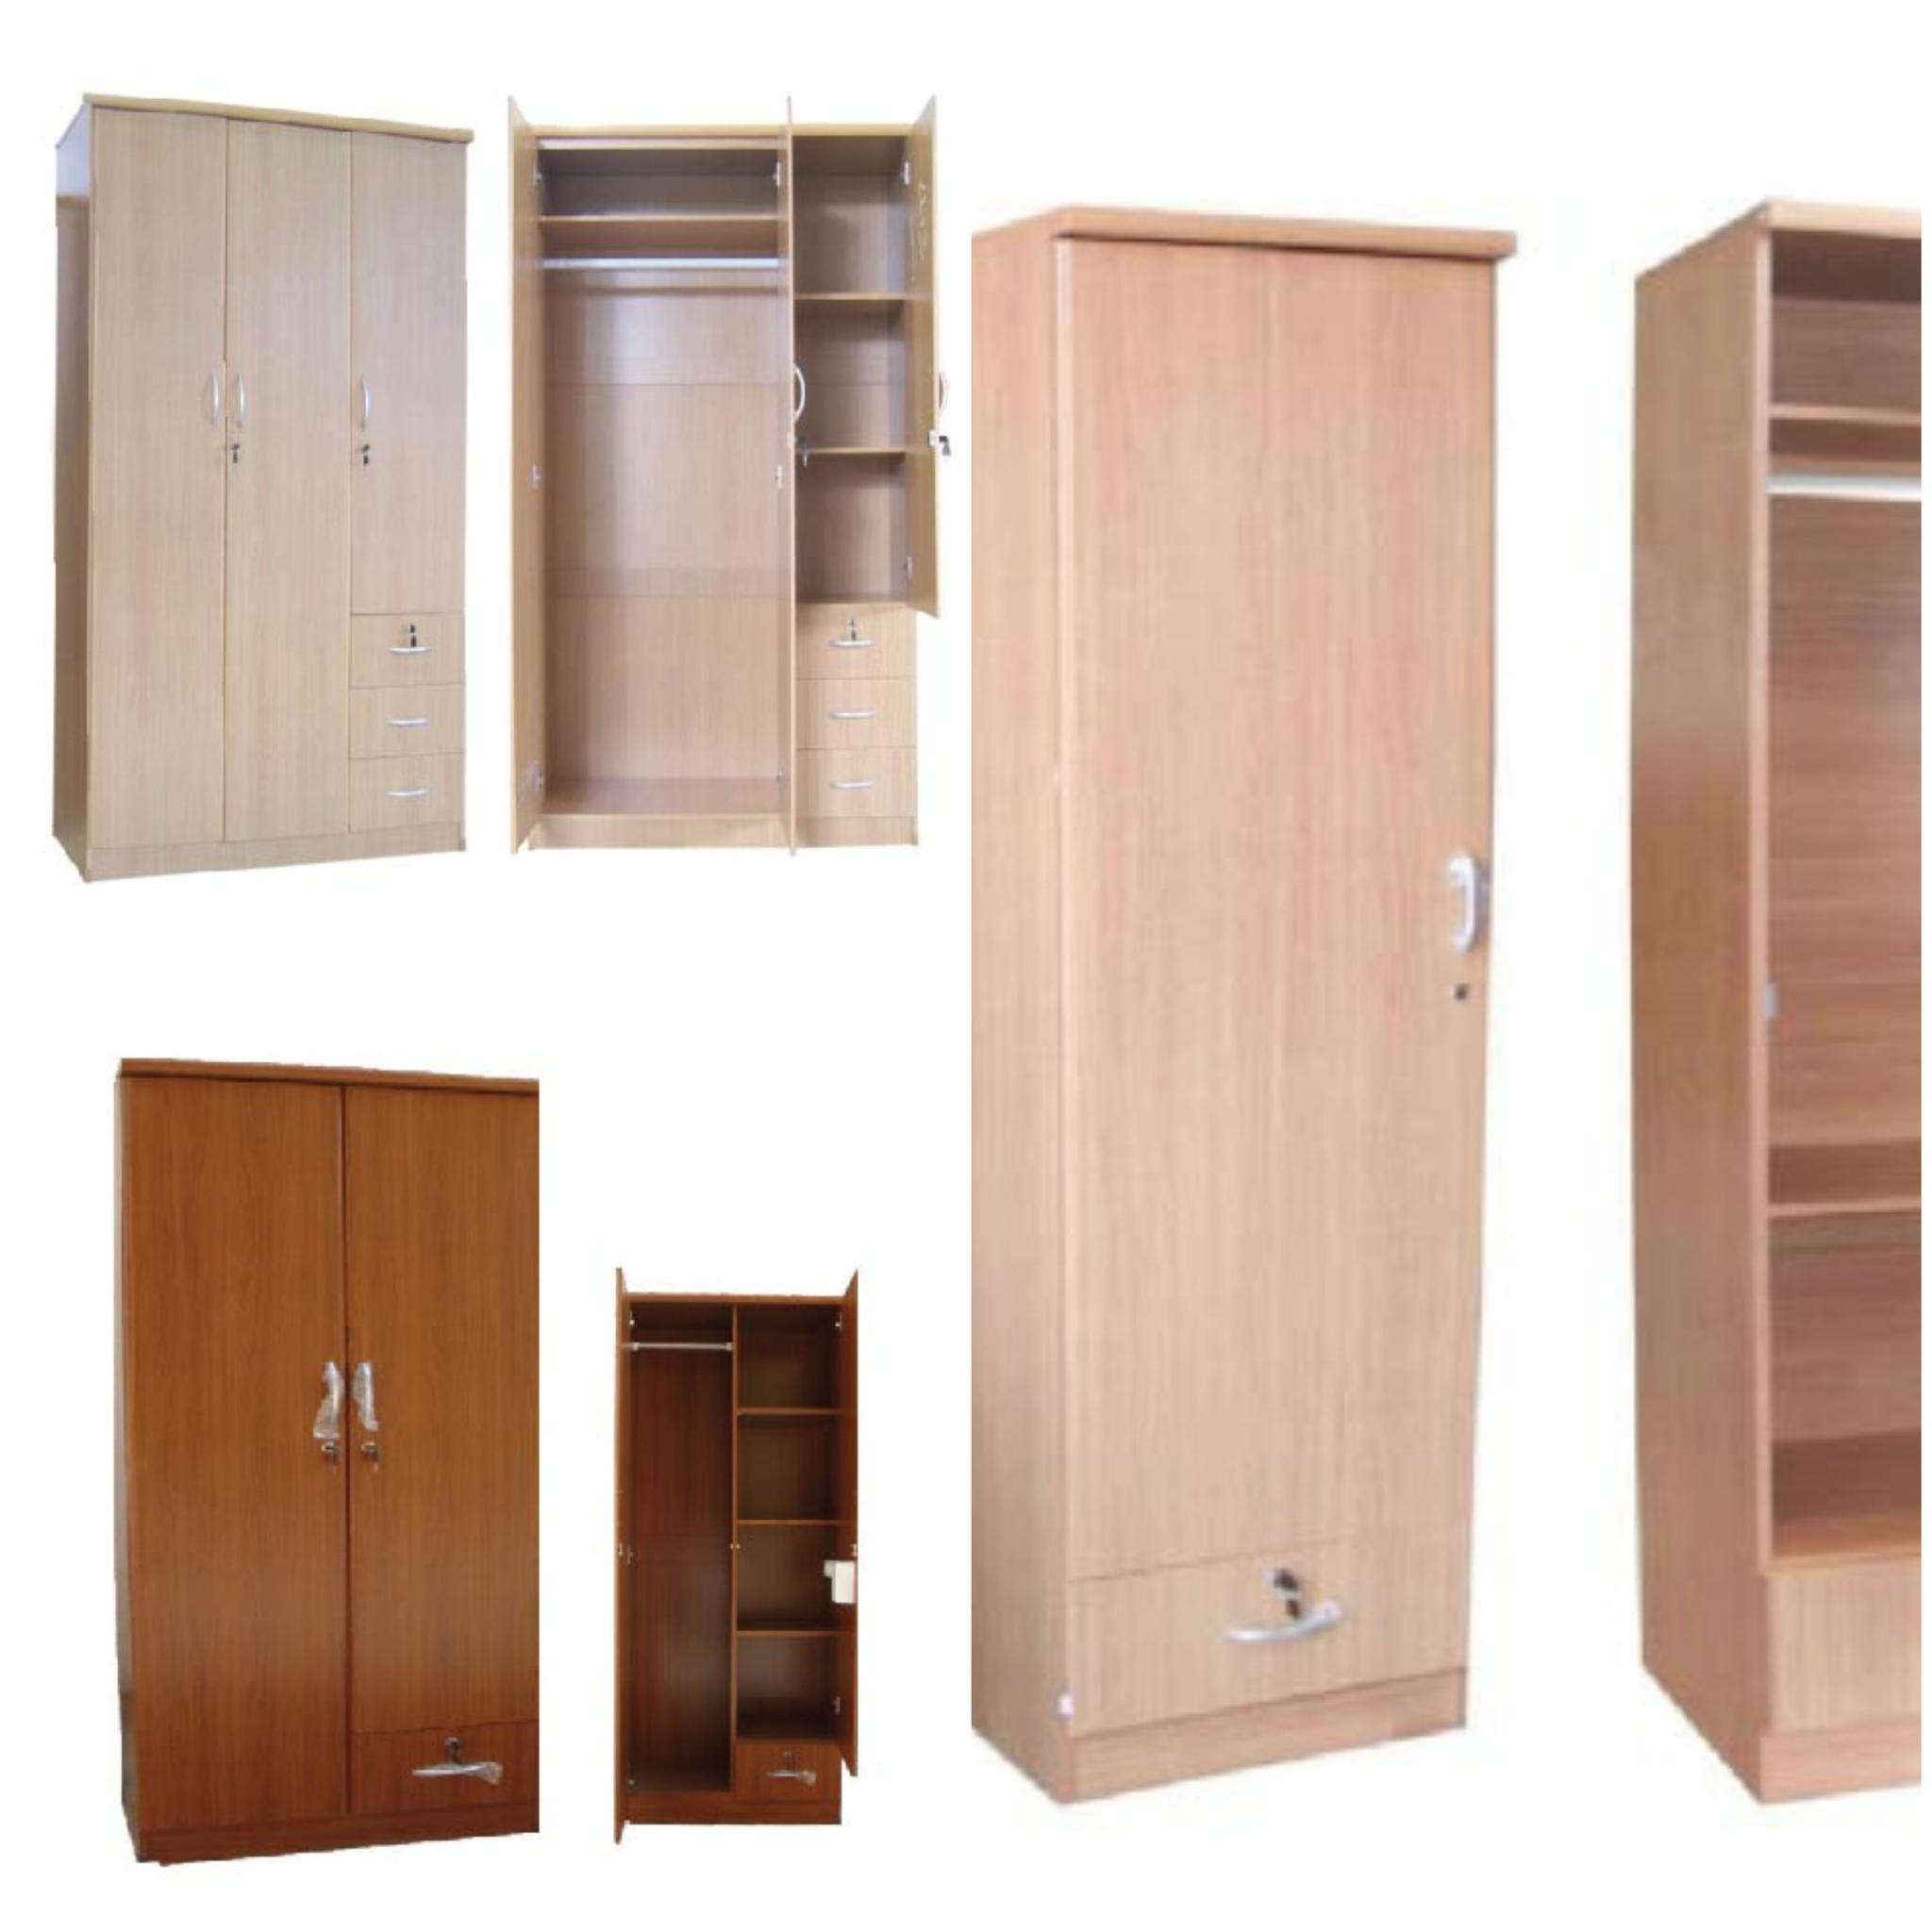 Hmoon Furniture online